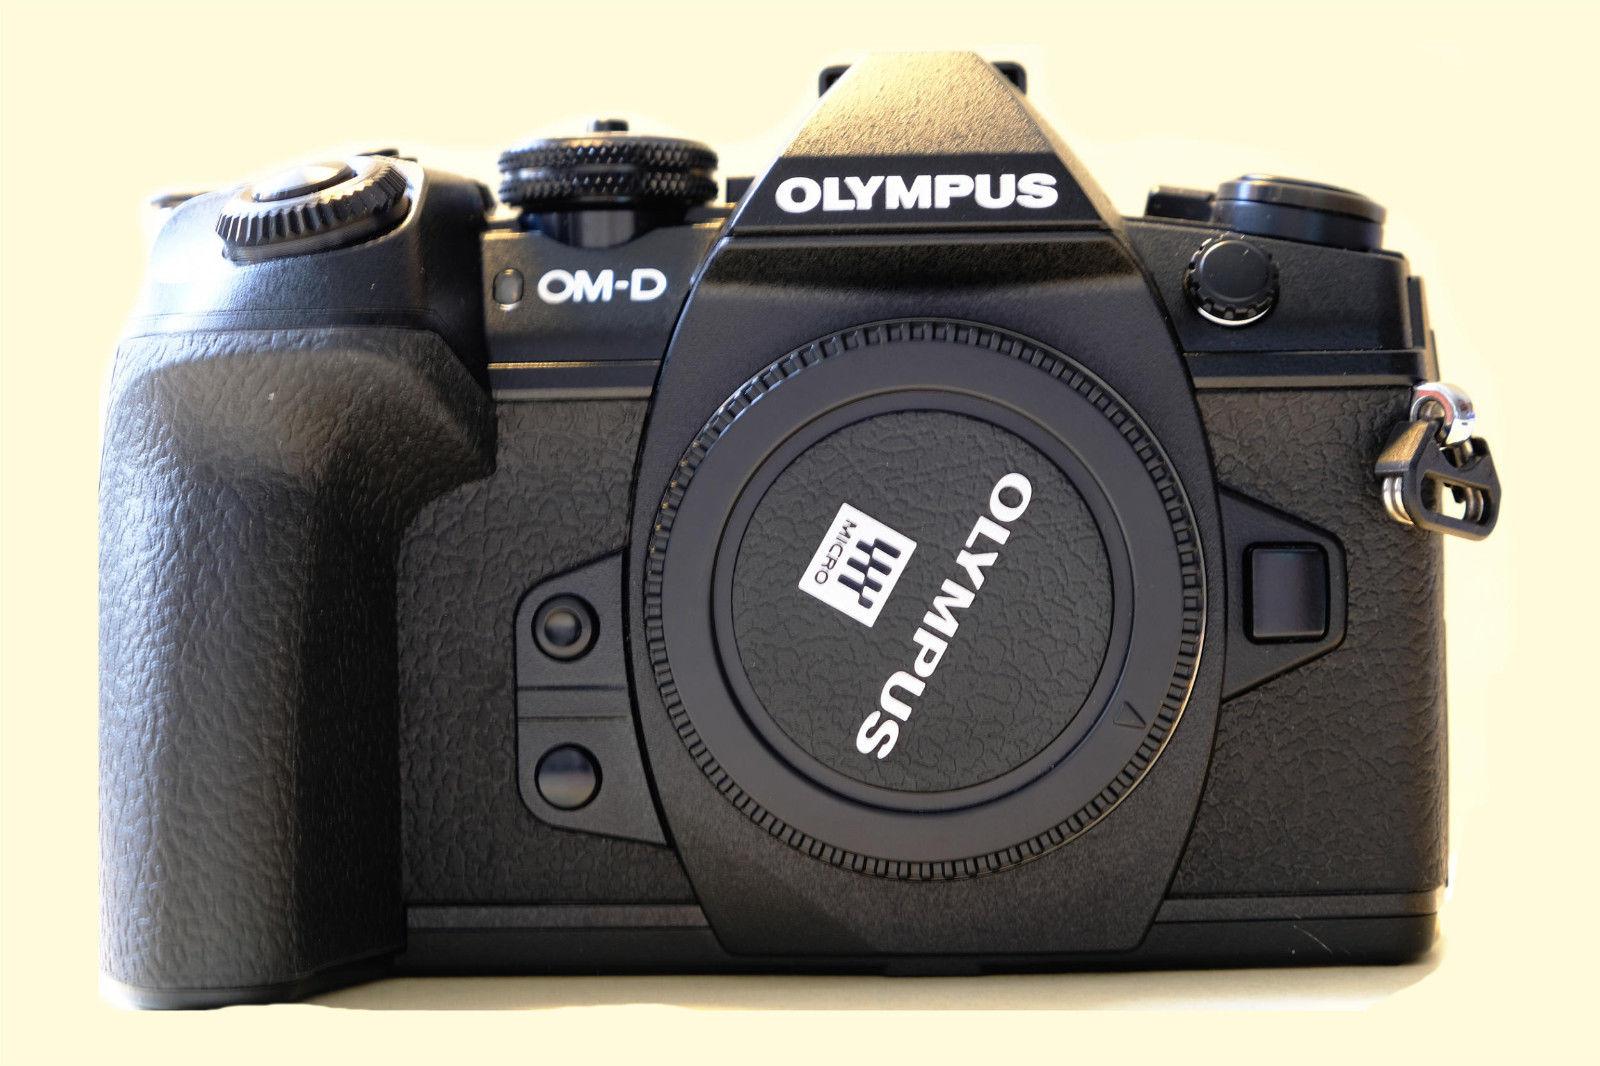 Olympus OM-D E-M1 Mark II 20.0 MP - schwarz (nur Gehäuse)